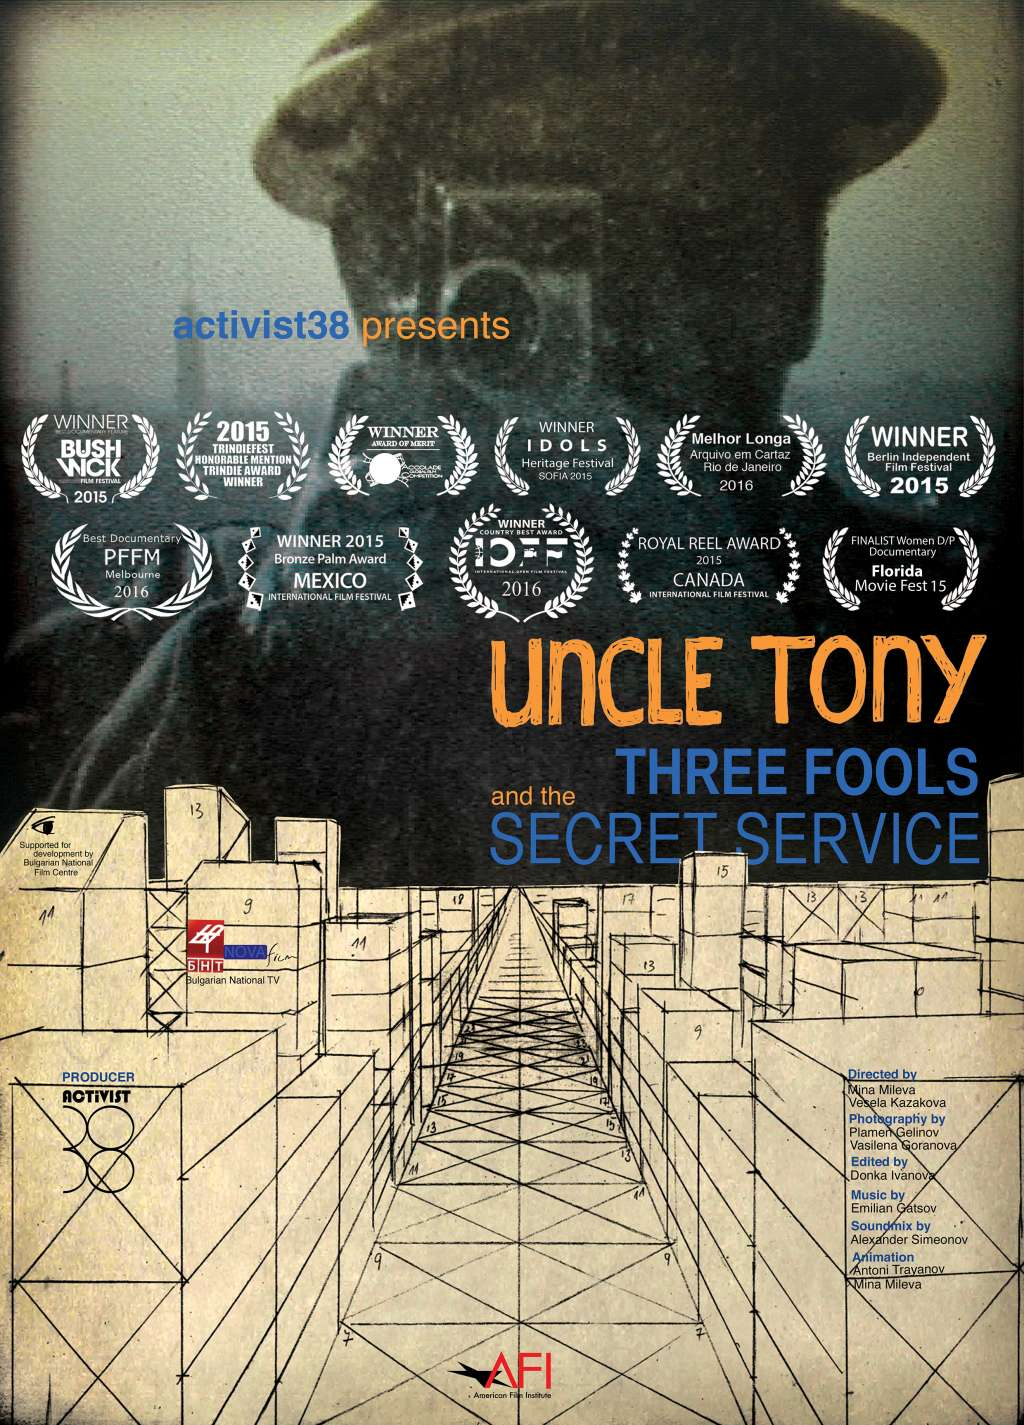 Uncle Tony, Three Fools and the Secret Service kapak